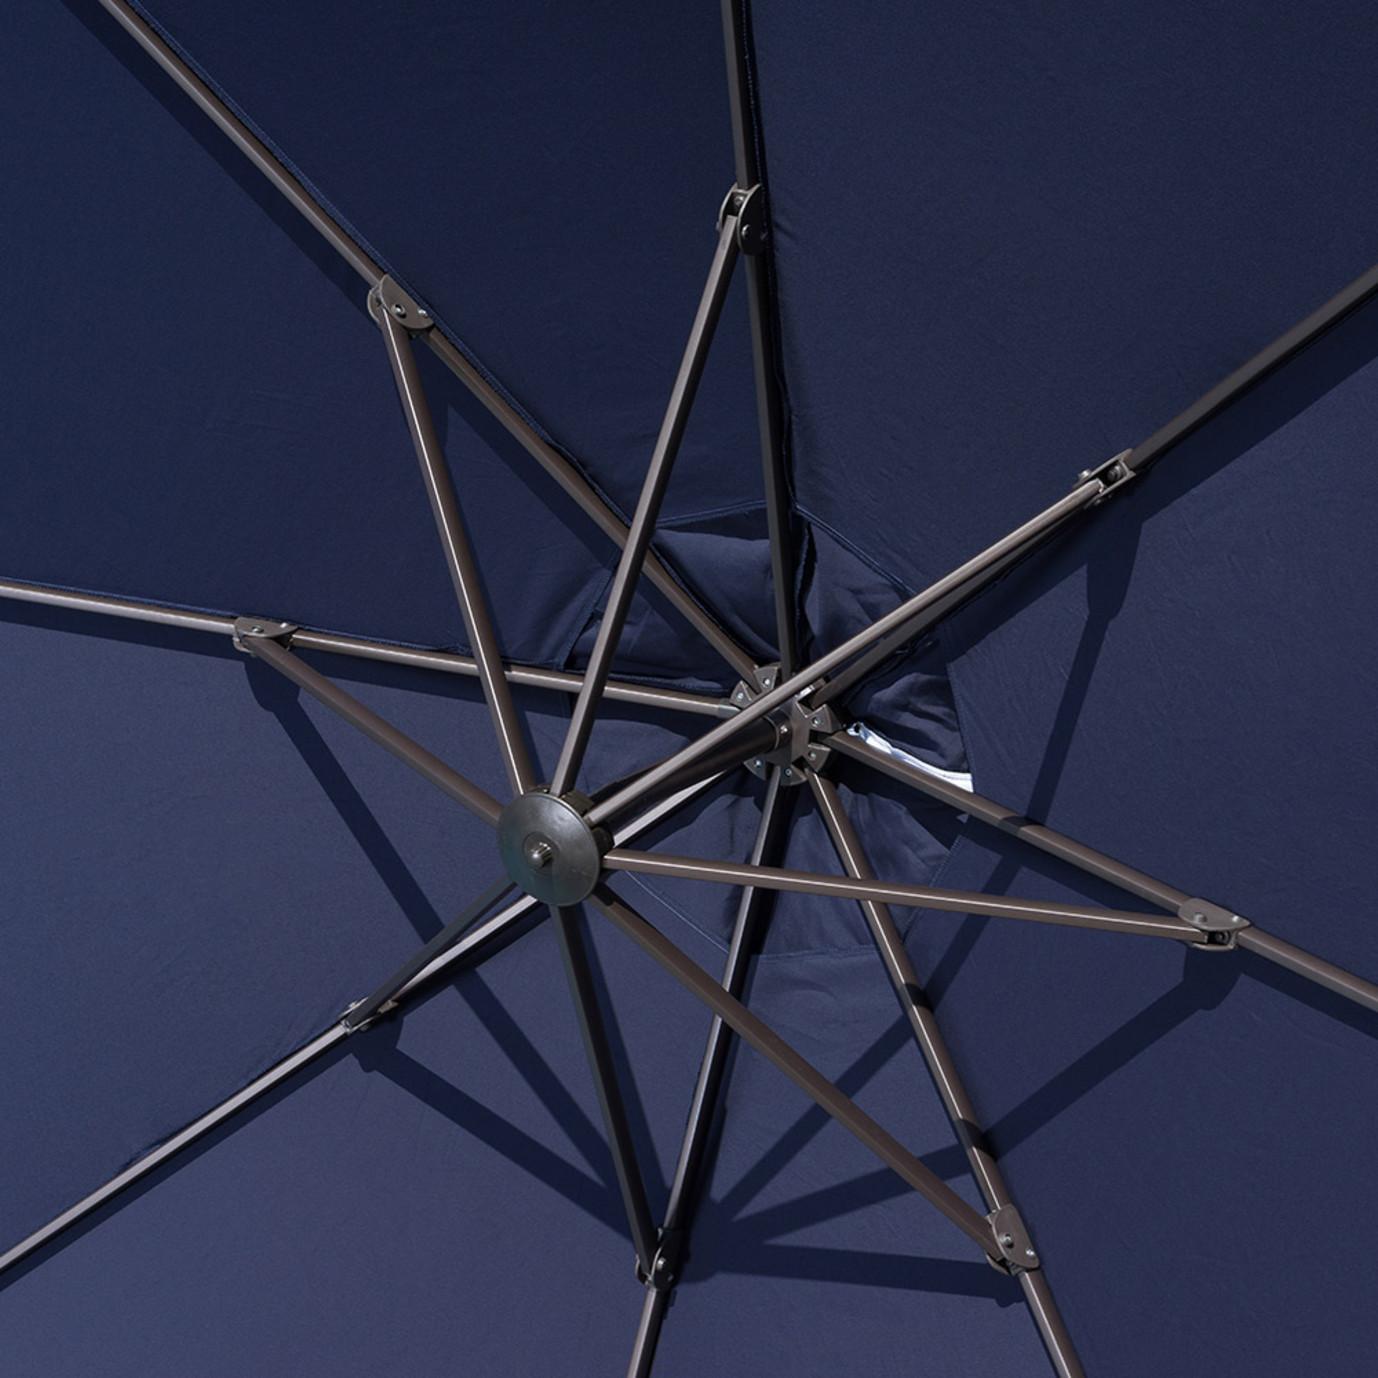 Modular Outdoor 10' Round Umbrella - Navy Blue